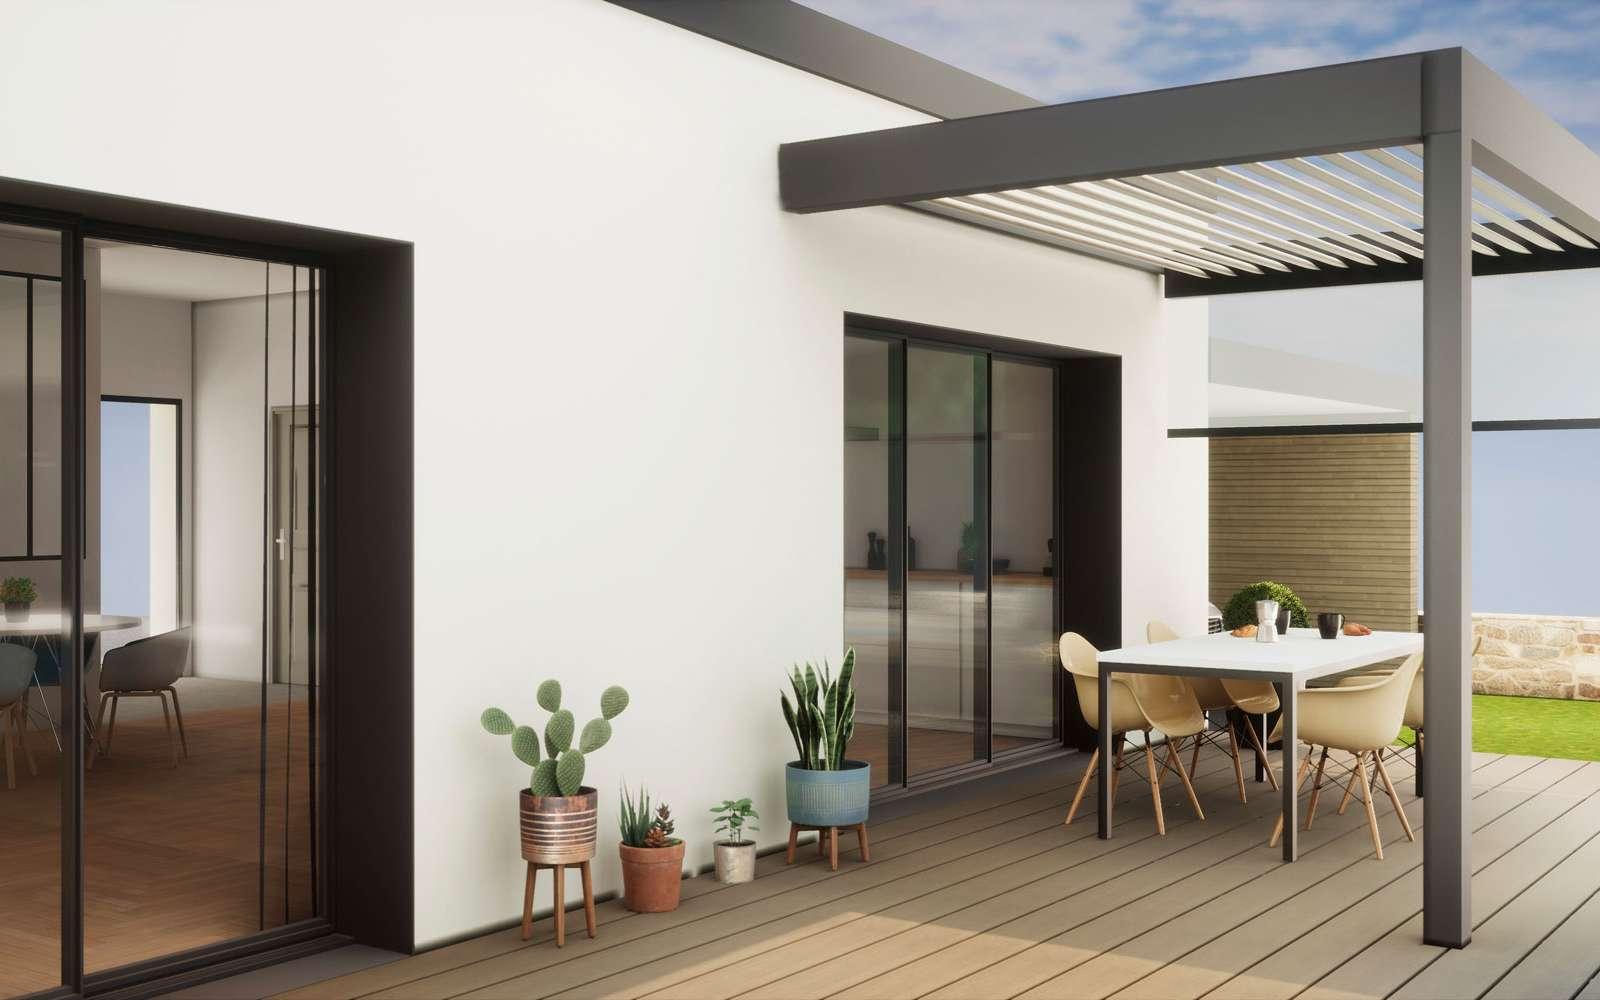 Photo d'une terrasse avec une véranda © alexande sveiger, Adobe Stock